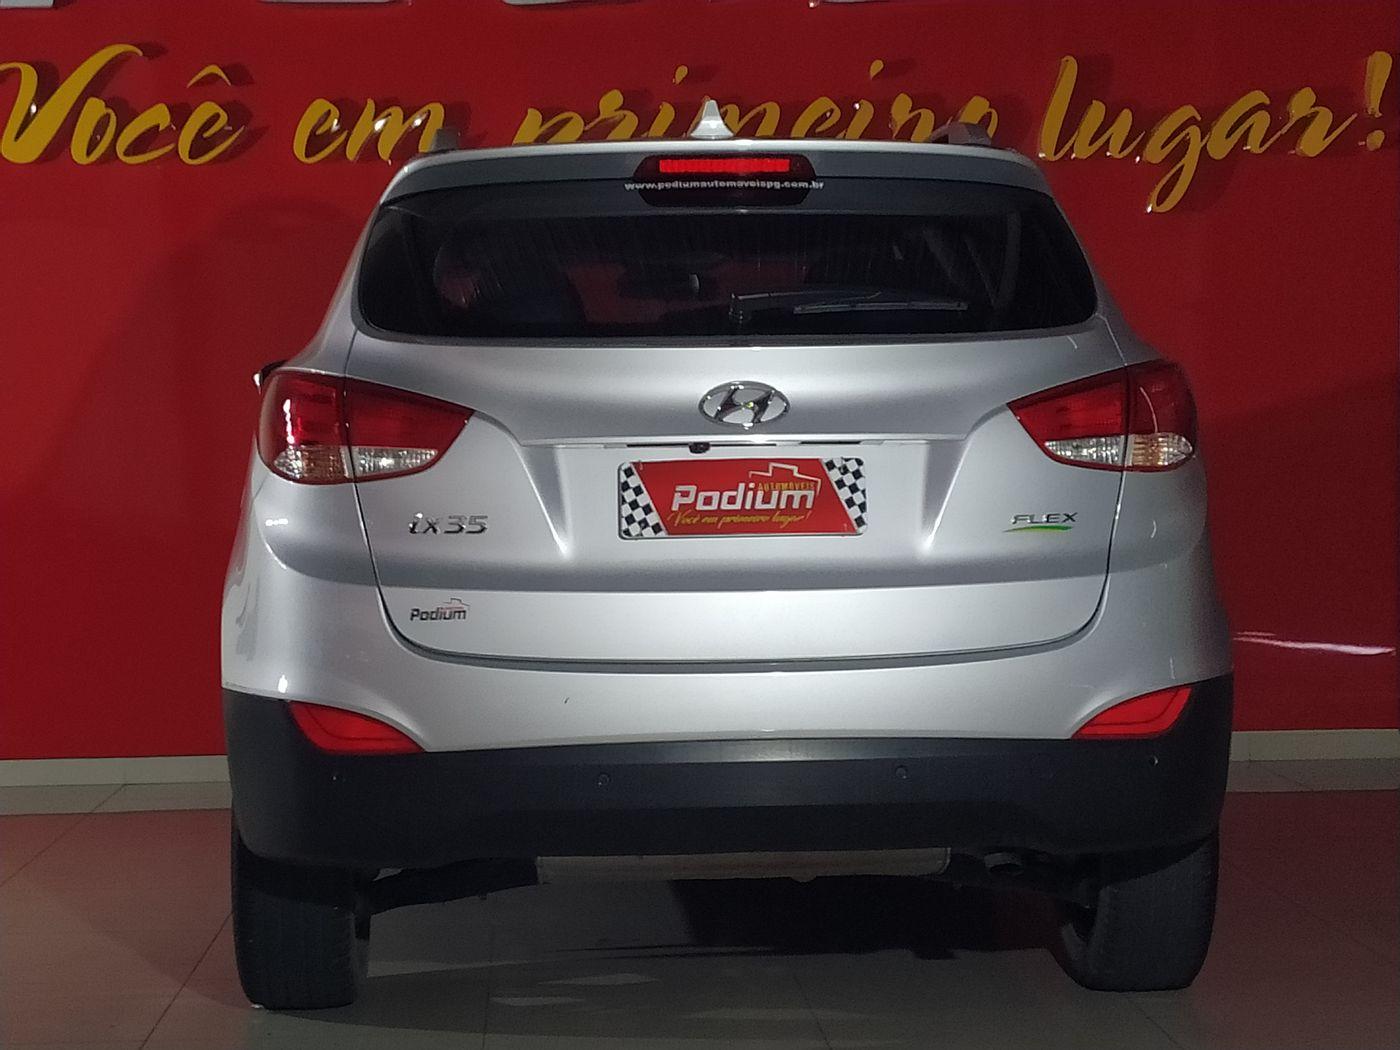 Hyundai ix35 2.0 Launching Edition 16V Flex Aut.